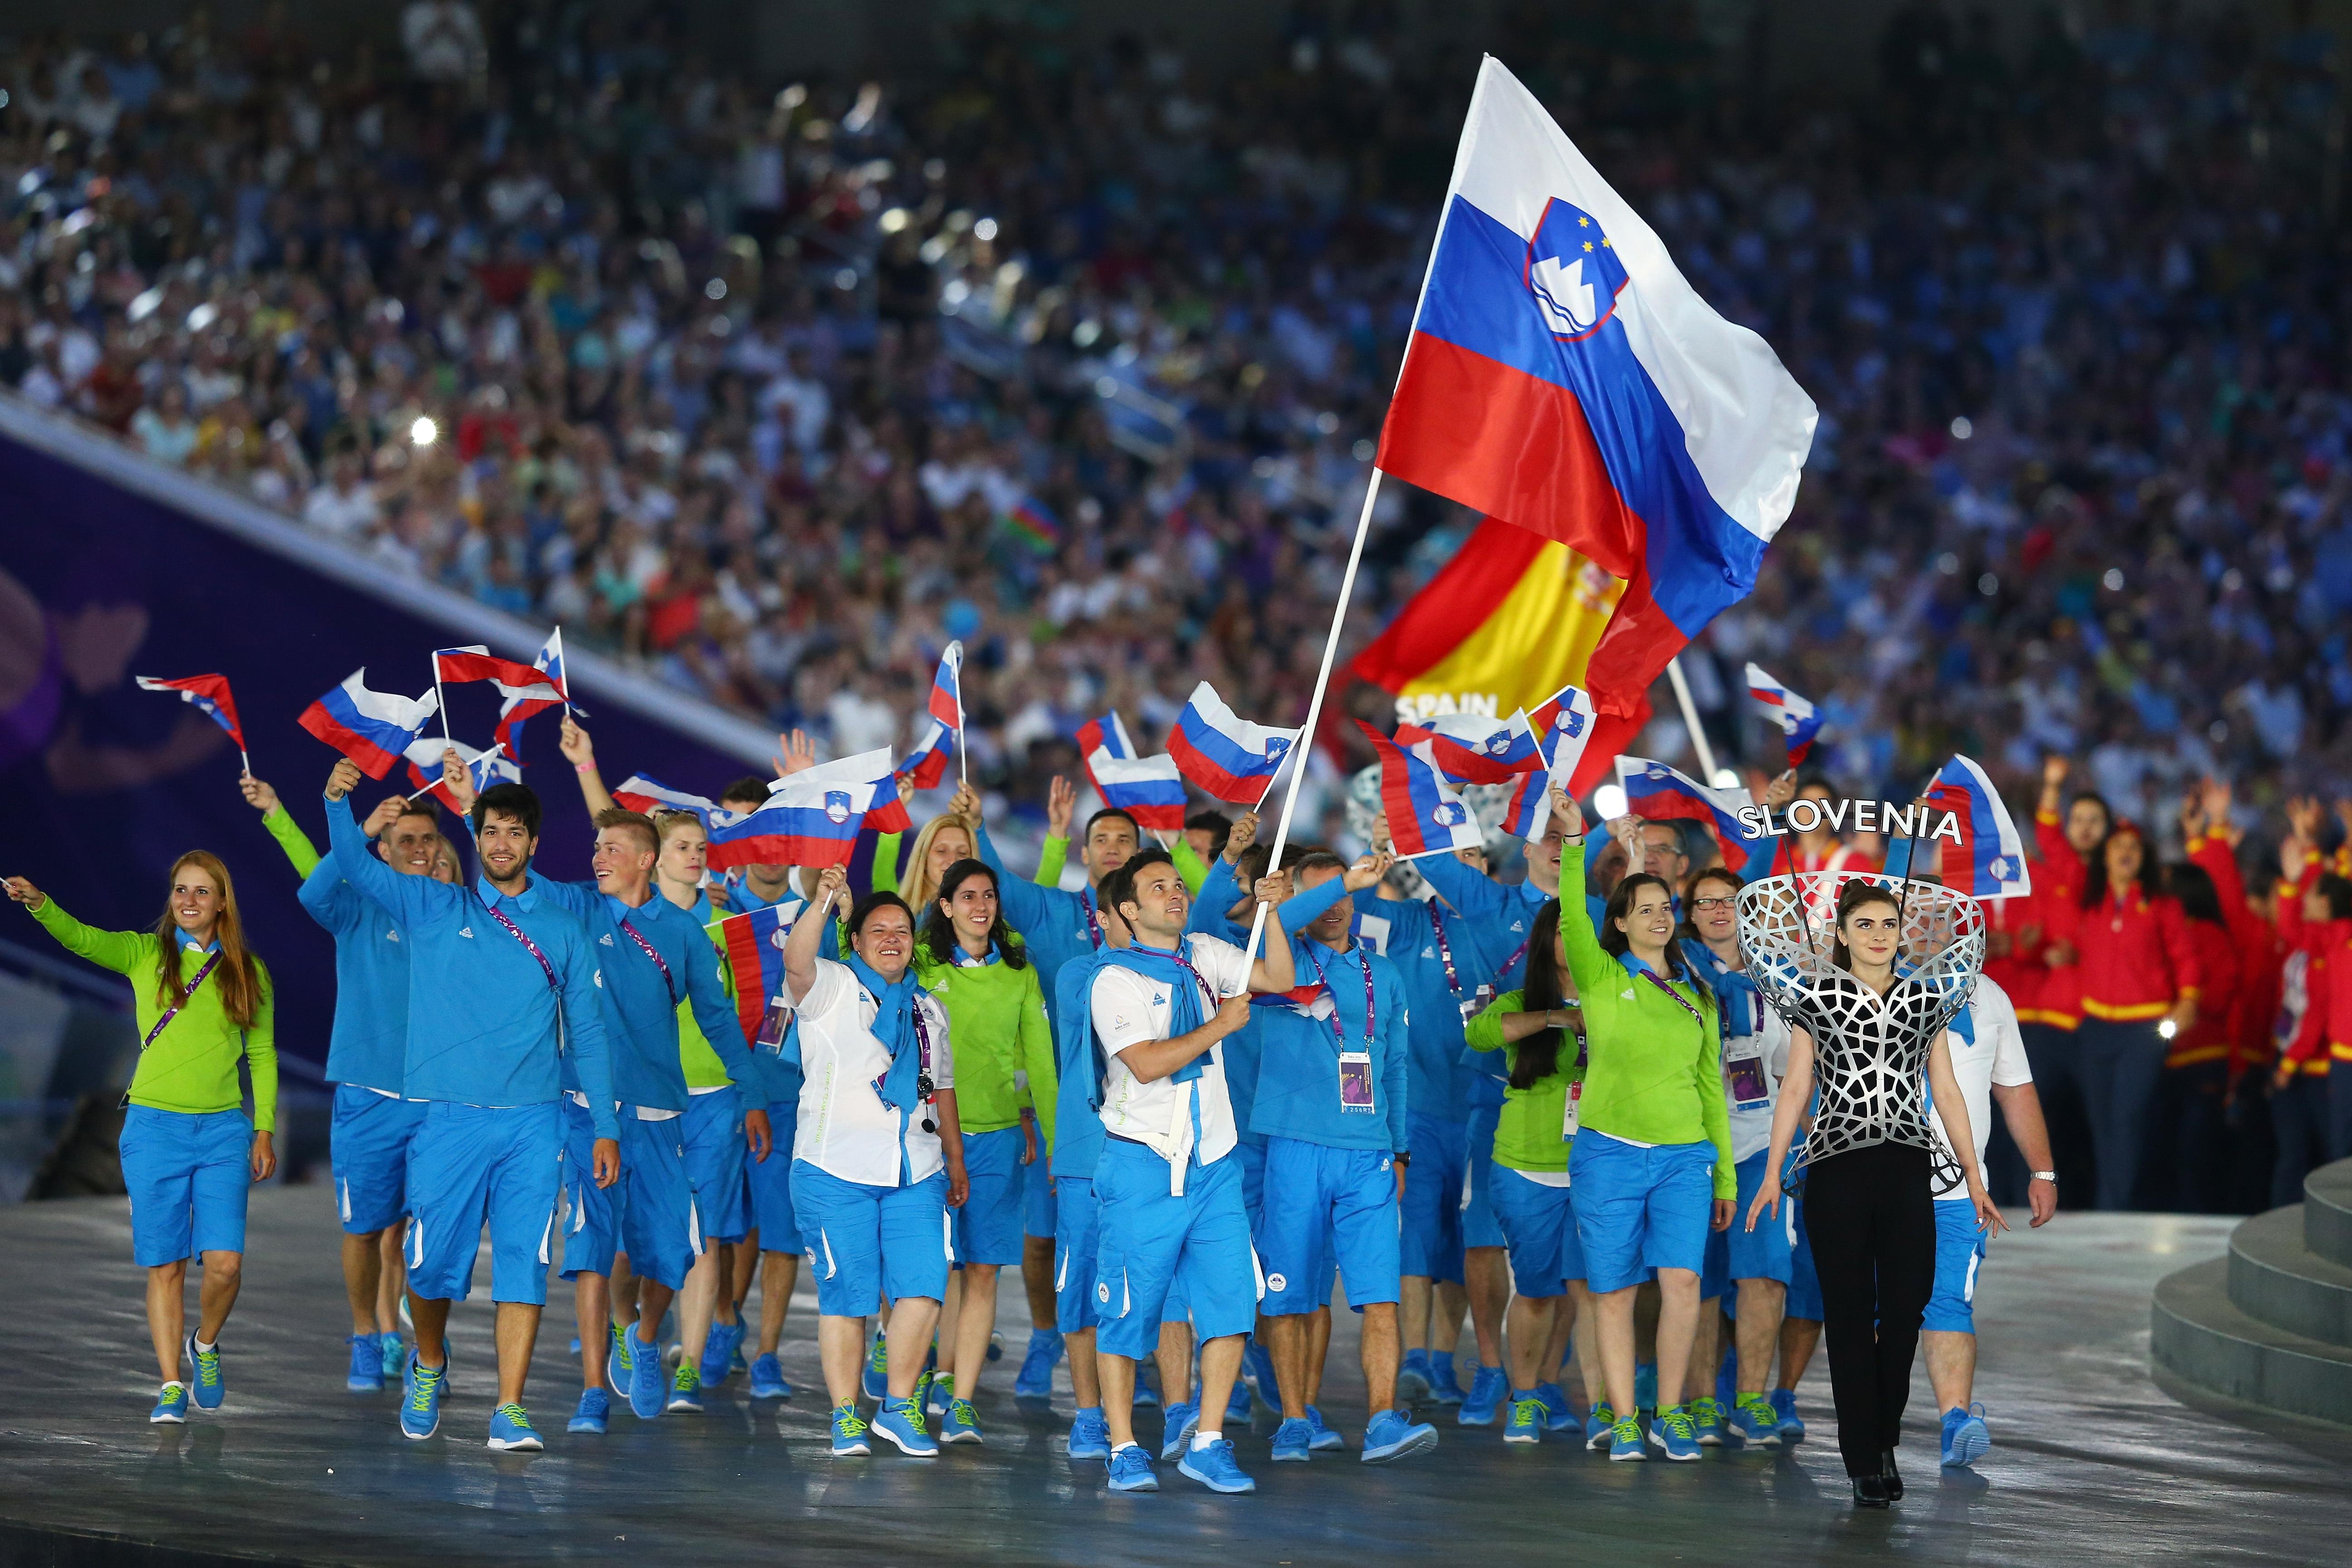 Slovenia at the Baku 2015 European Games.